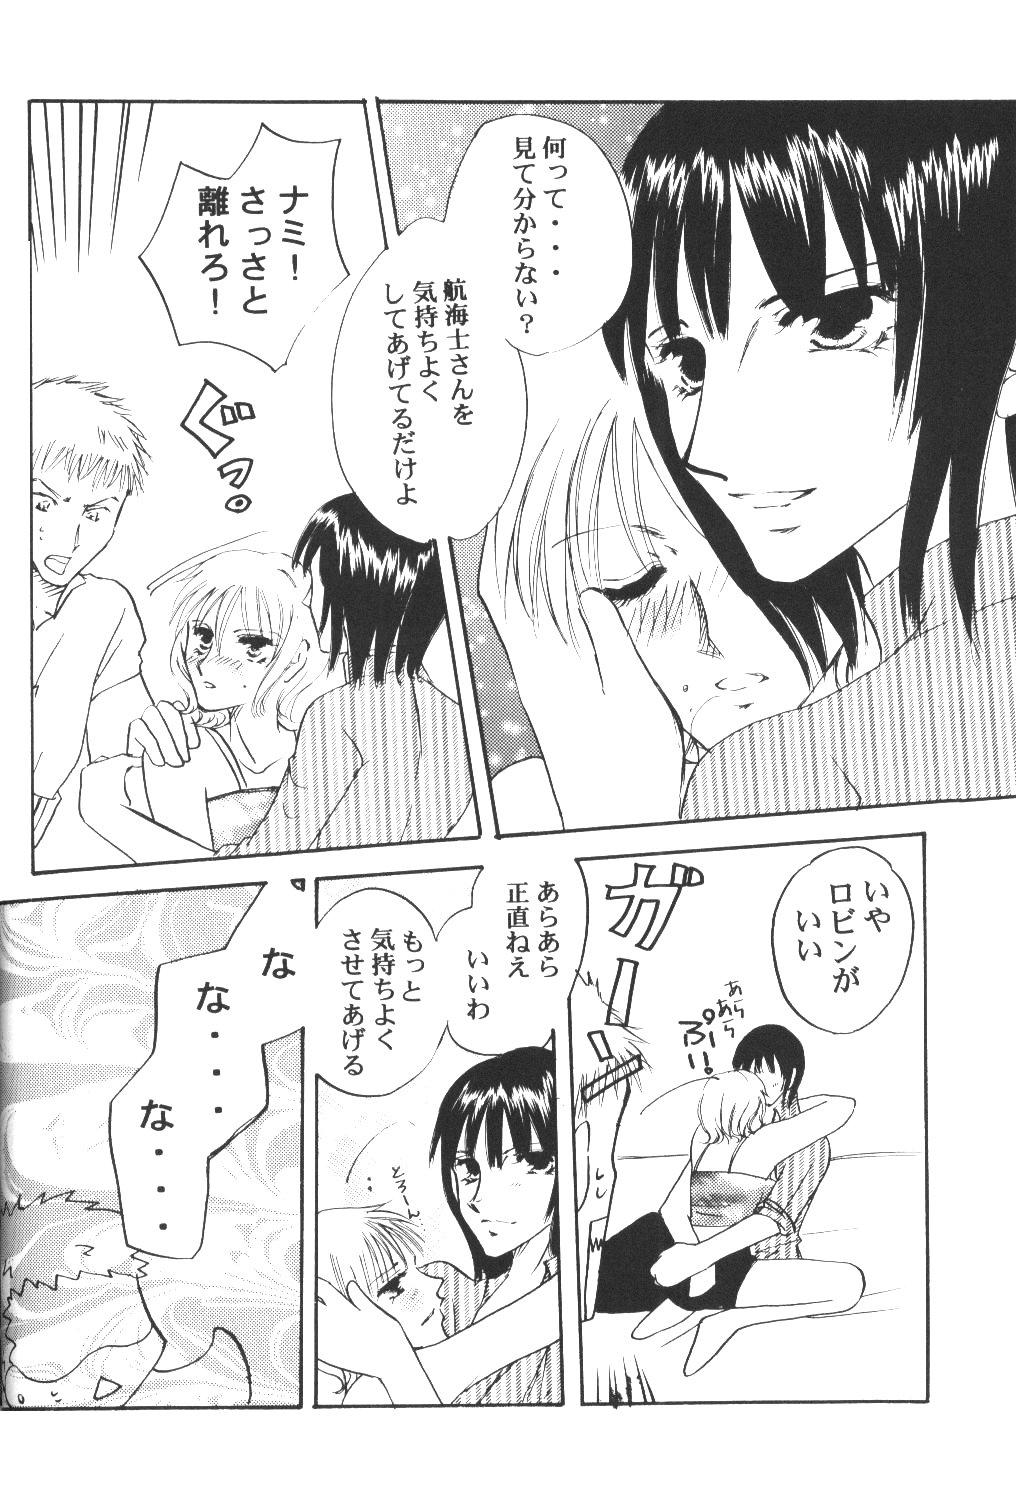 Yume Ichiya 2 142